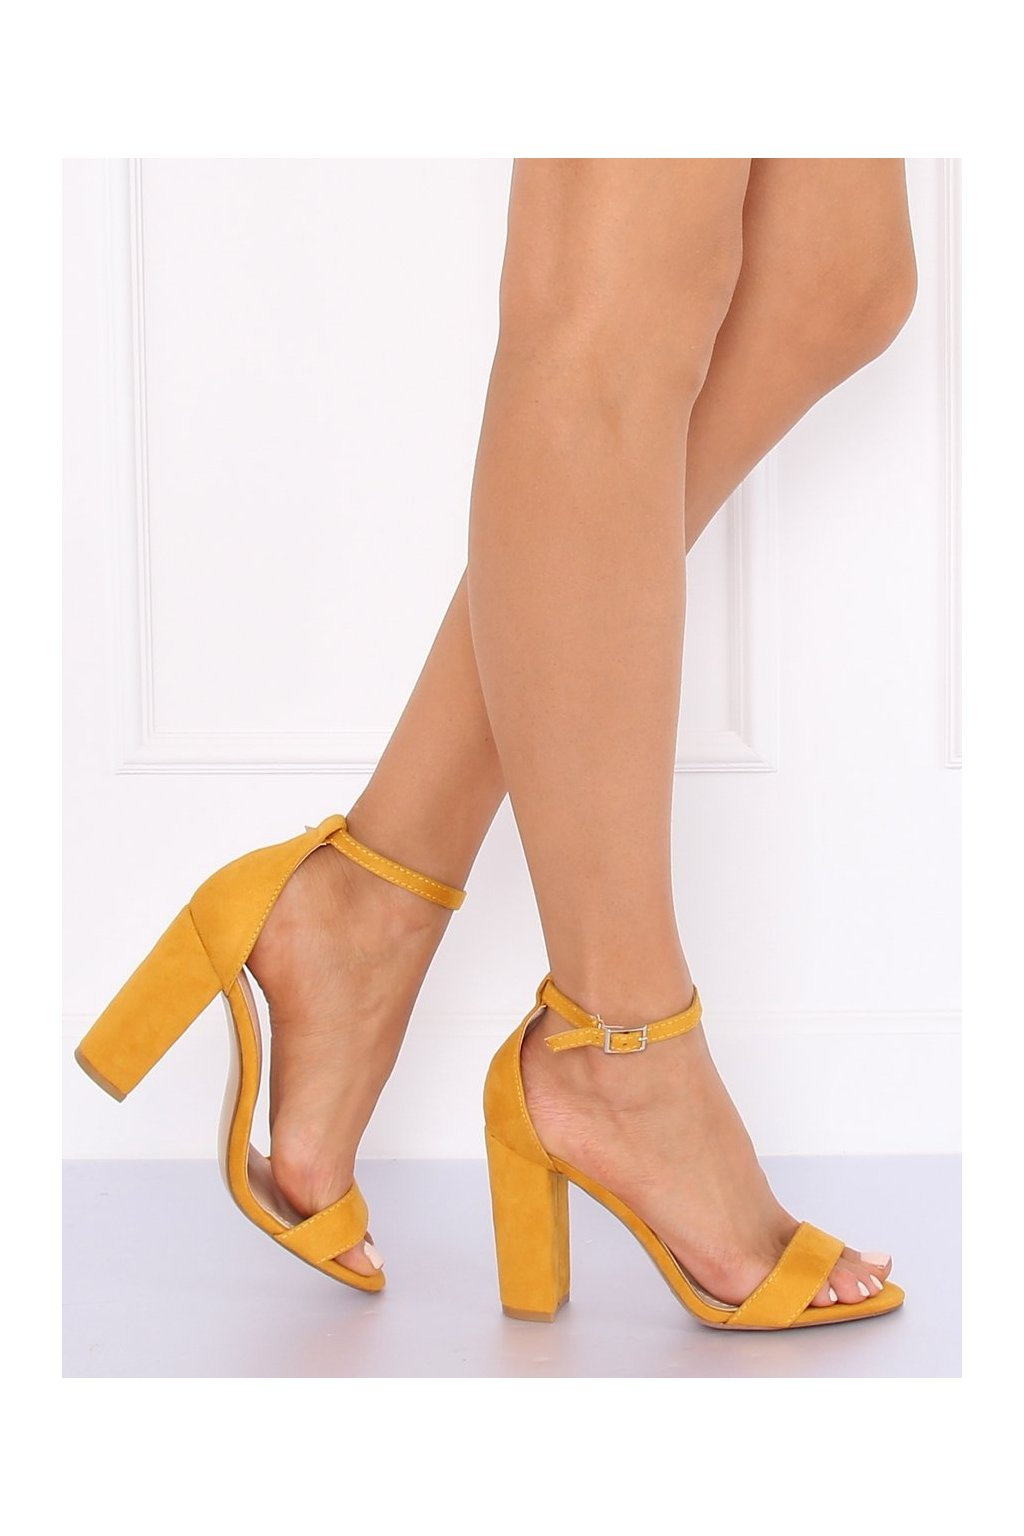 Damske sandále žlté na stĺpovom podpätku Y2385-27